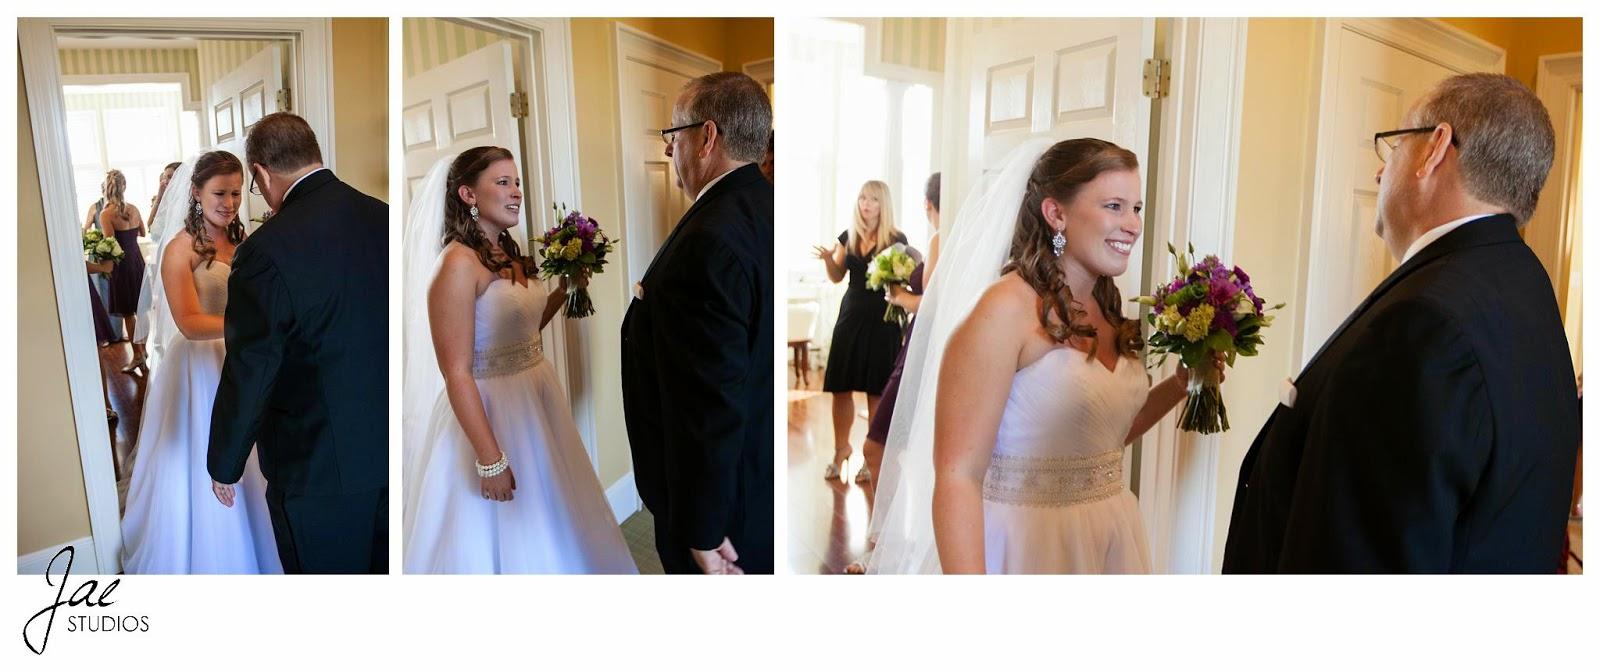 Jonathan and Julie, Bird cage, West Manor Estate, Wedding, Lynchburg, Virginia, Jae Studios, wedding dress, bridesmaids, father, flowers, bouquet, veil, crying, laughing, getting ready